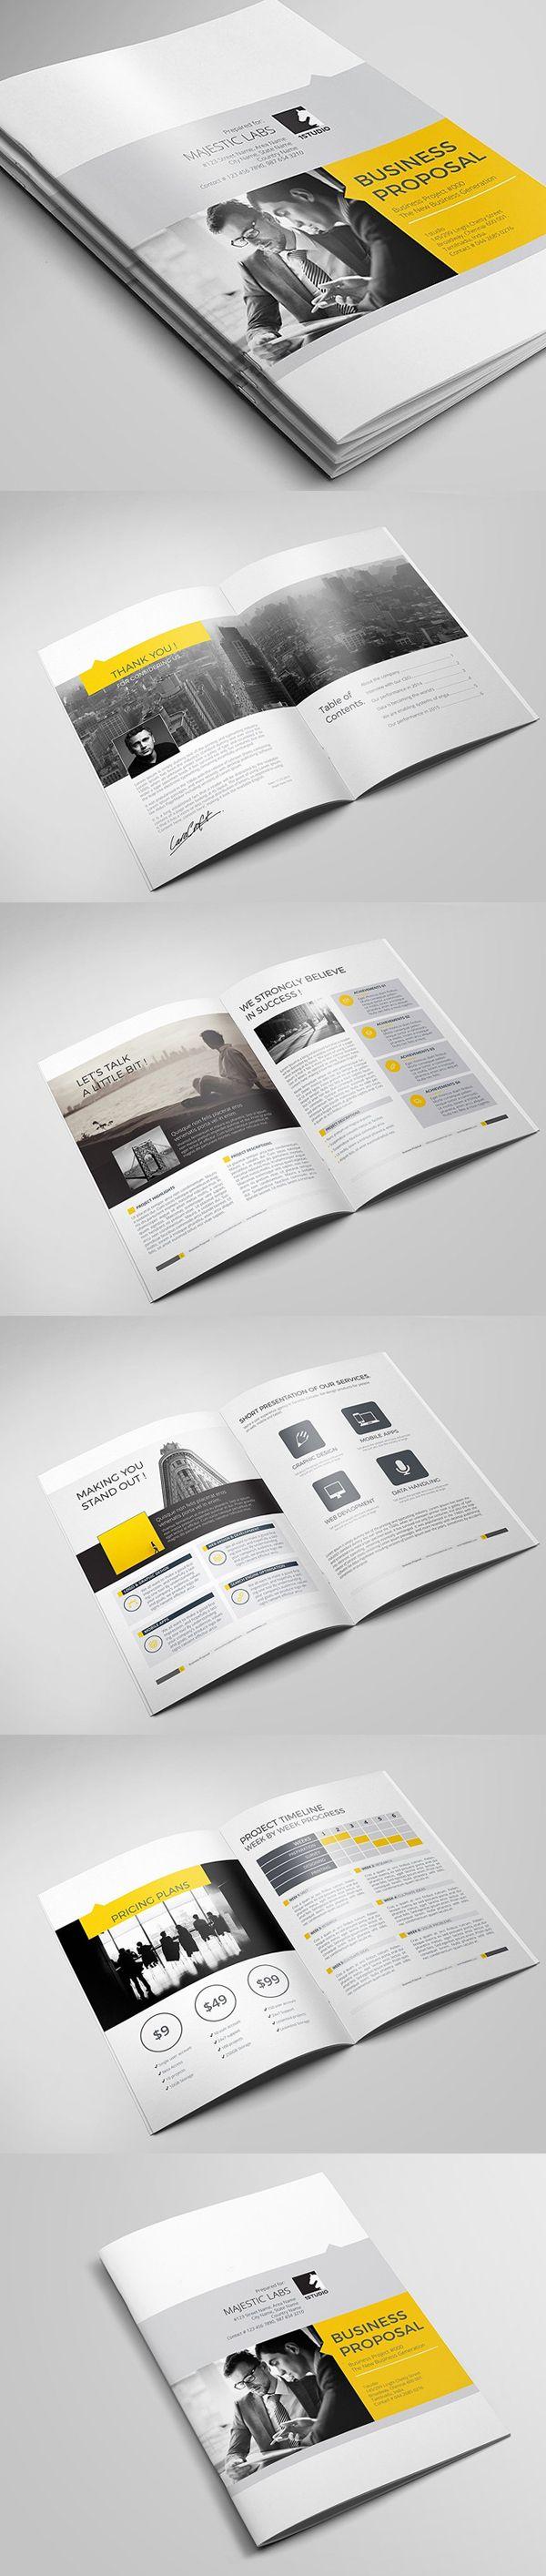 Business Proposal Brochure Template  Design Inspiration